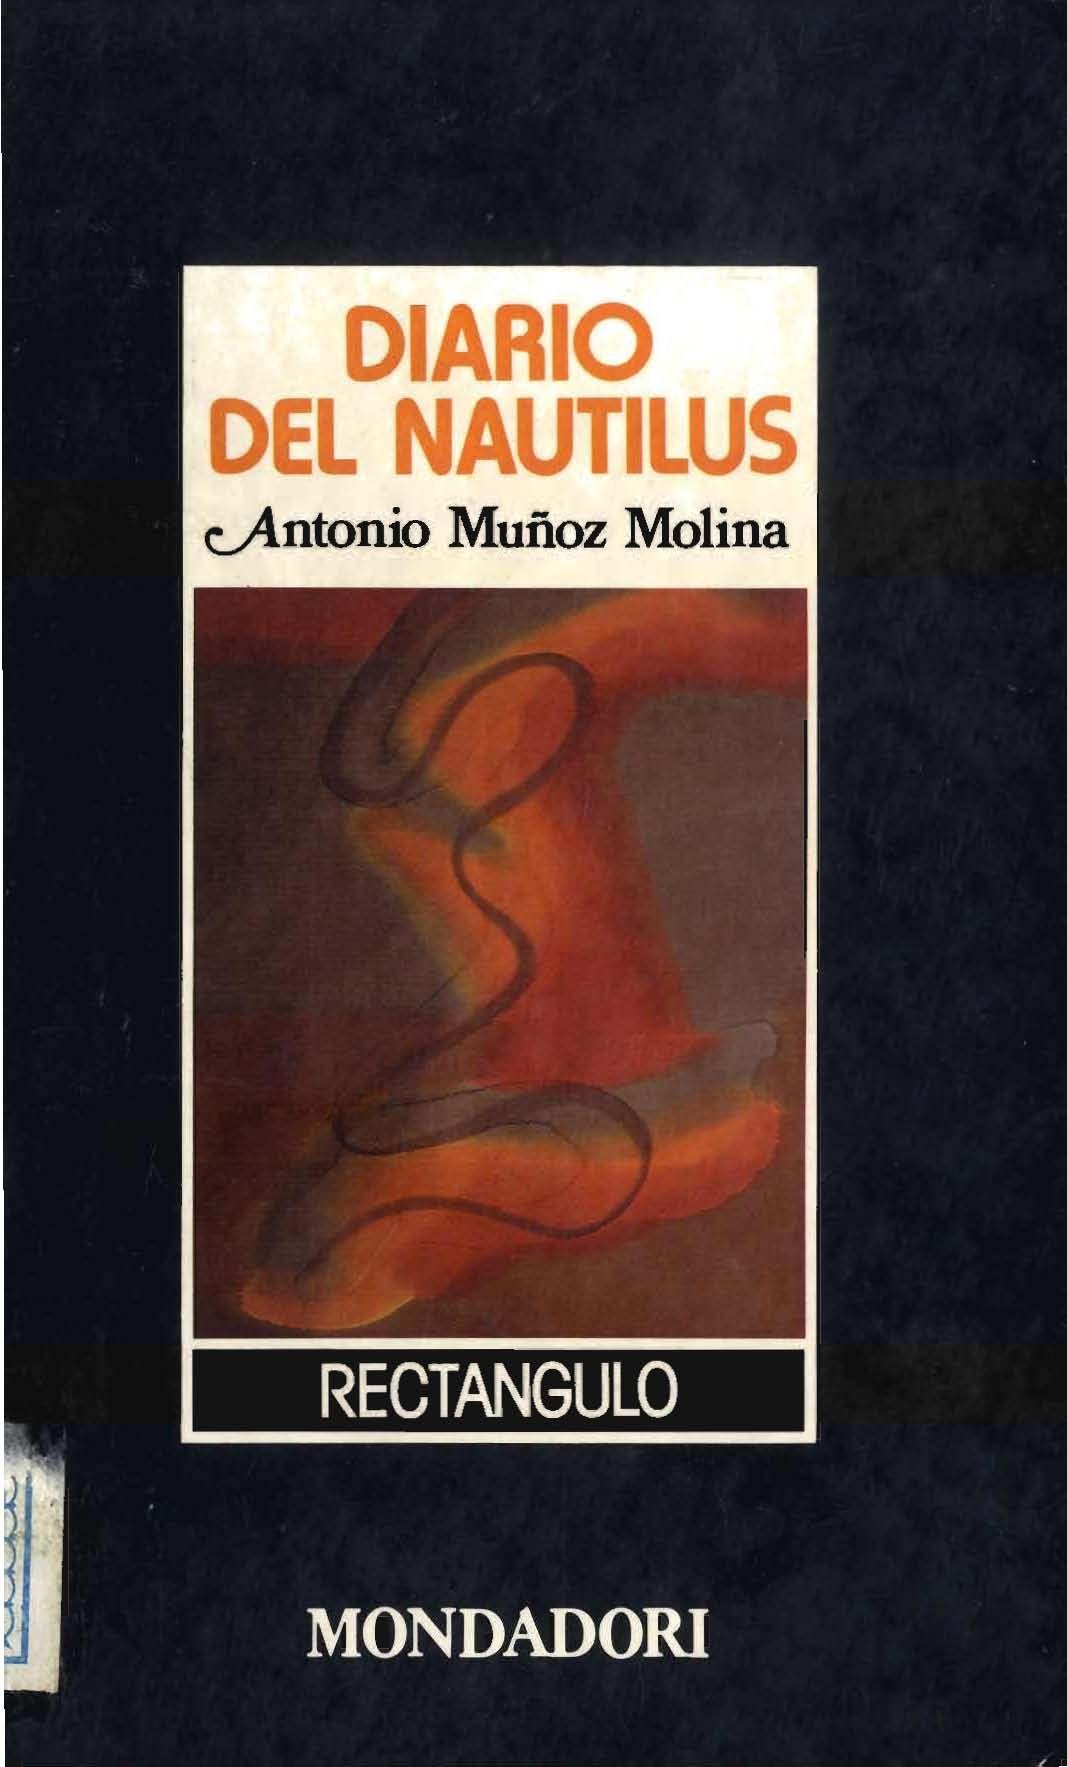 Diario del Nautilus / Antonio Muñoz Molina Libros